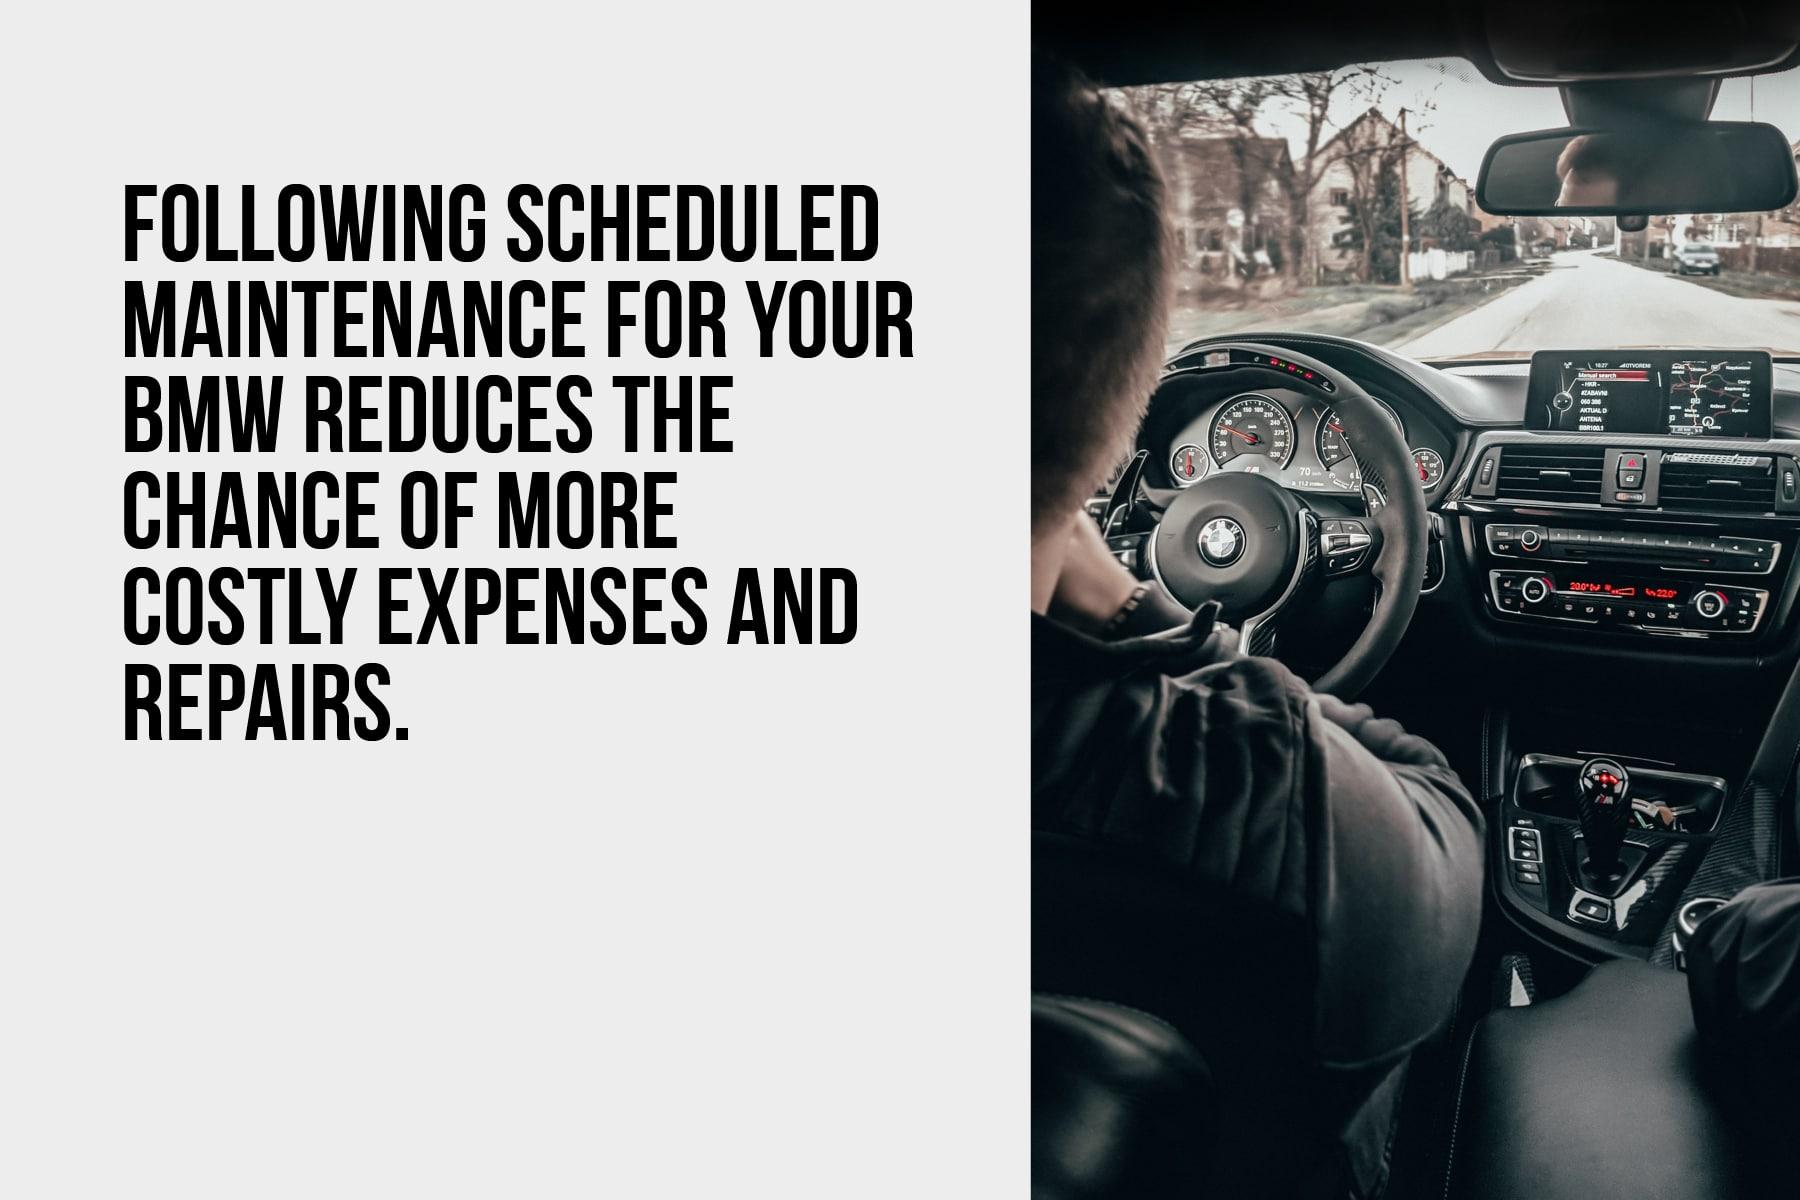 Regular BMW maintenance is important